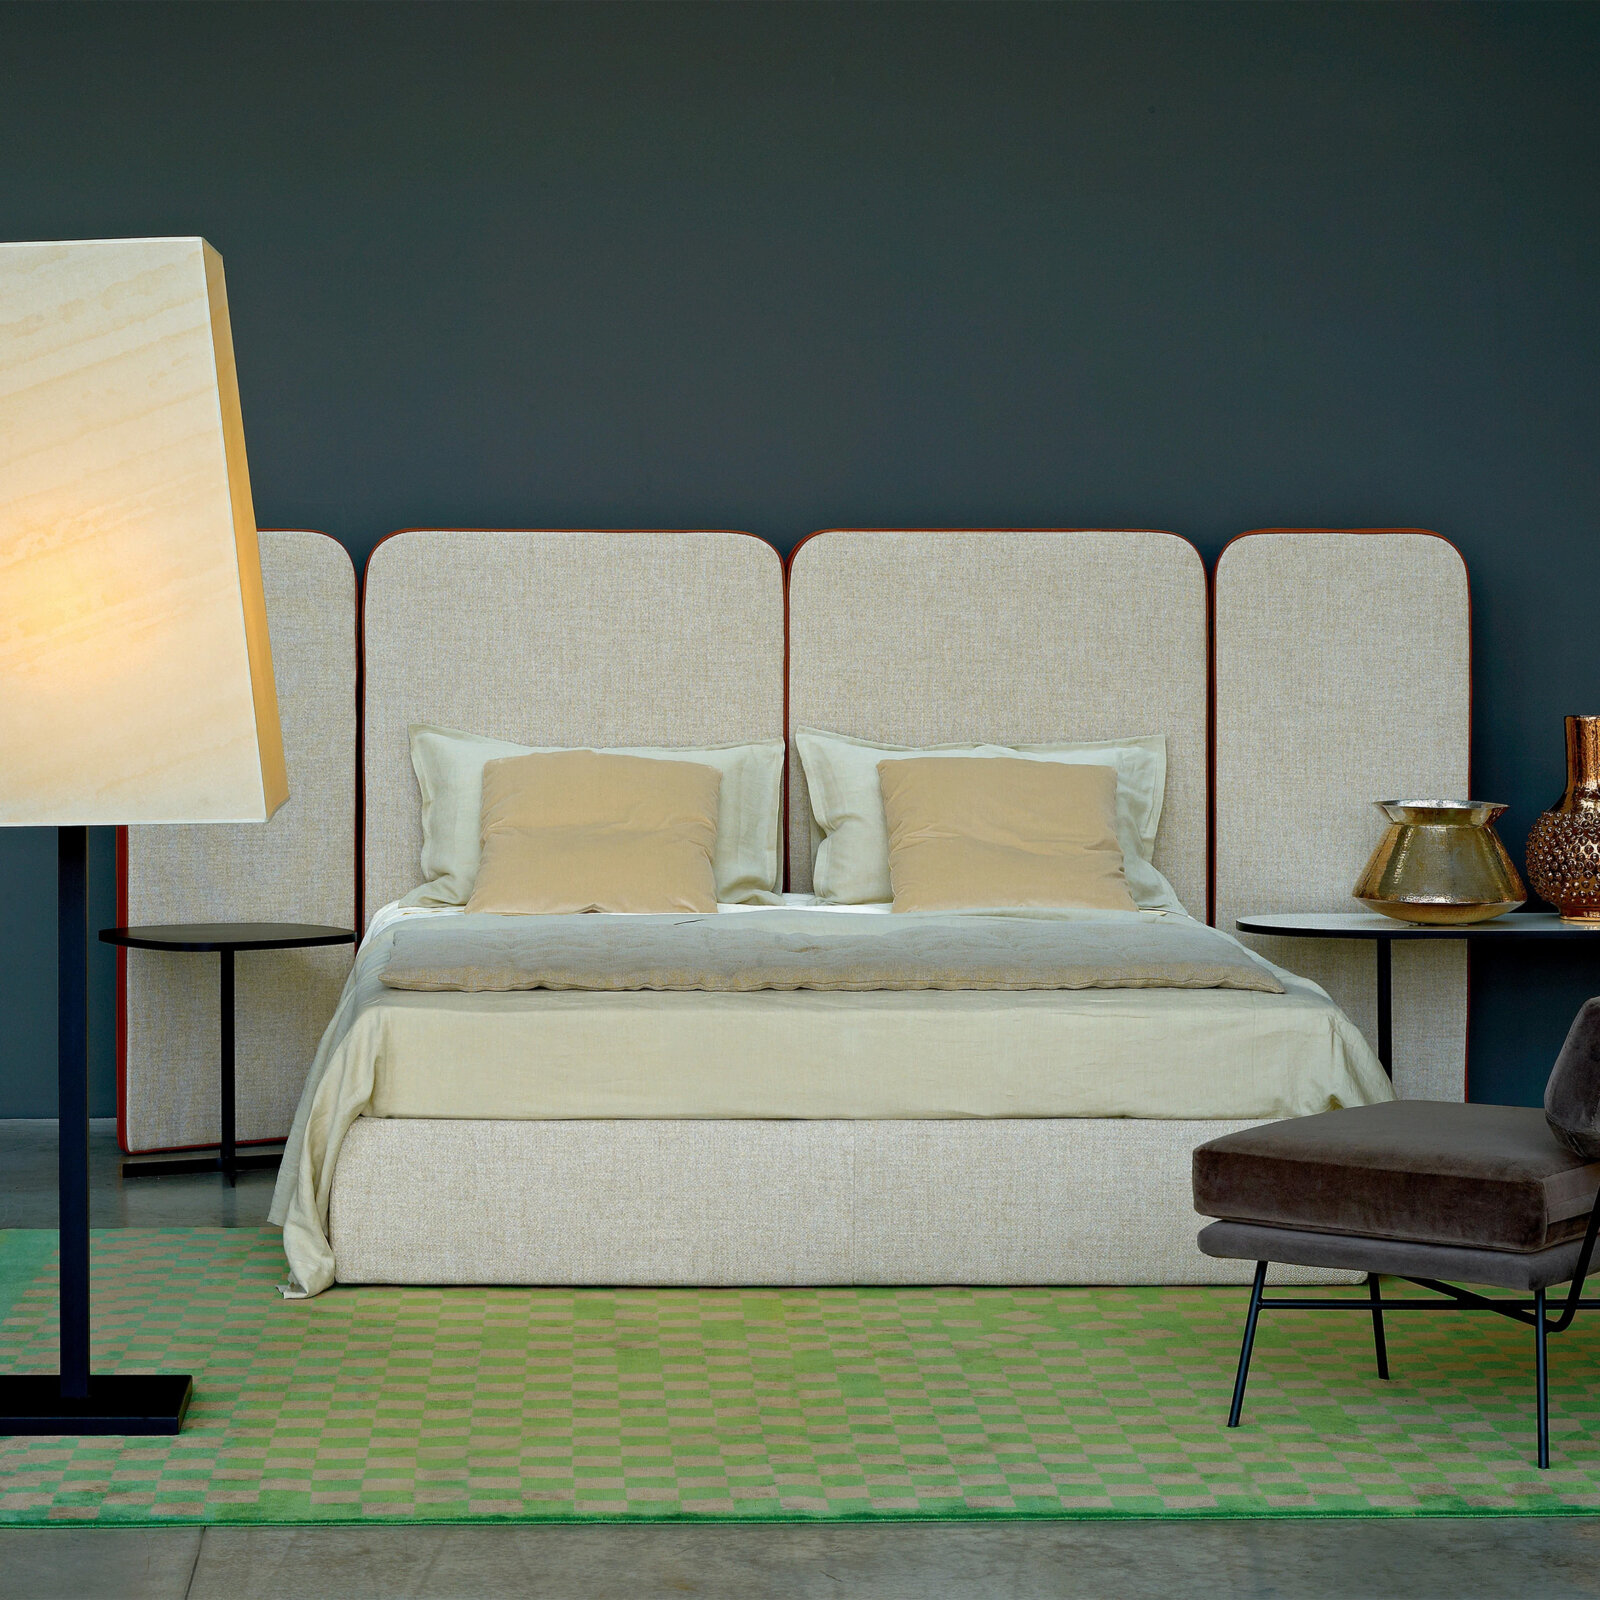 TinnappleMetz-arflex-palazzo-bed-01